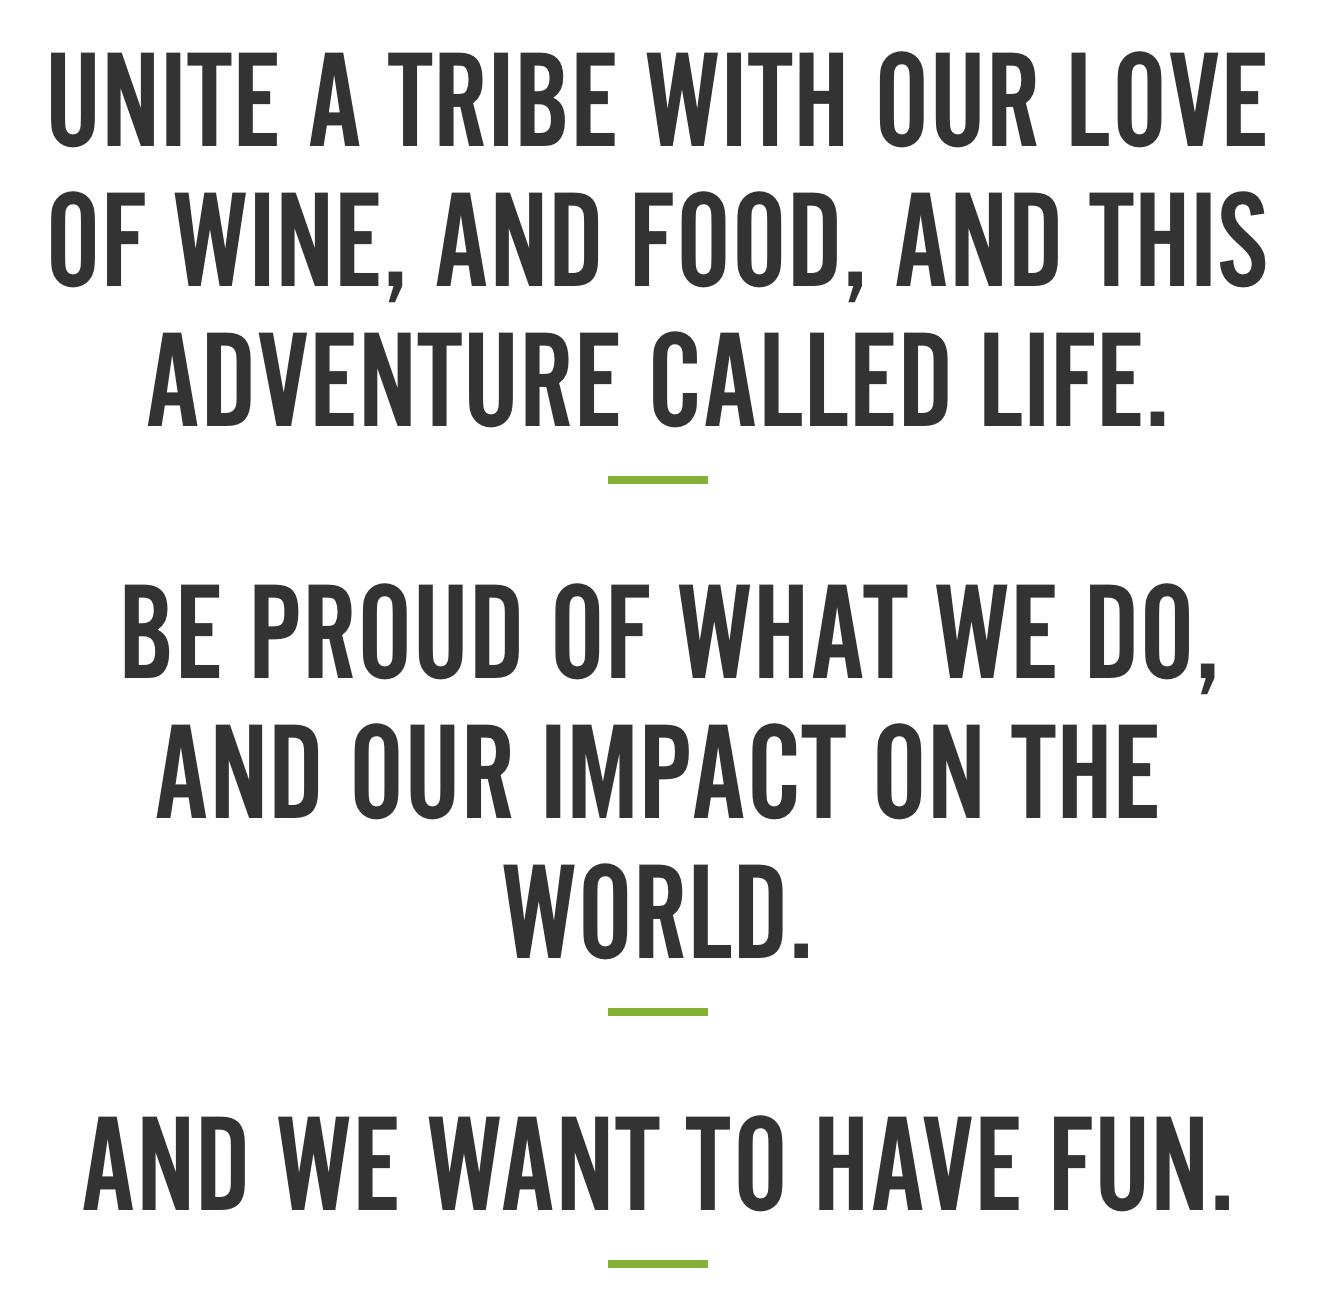 vinomofo-culture-mission-statement